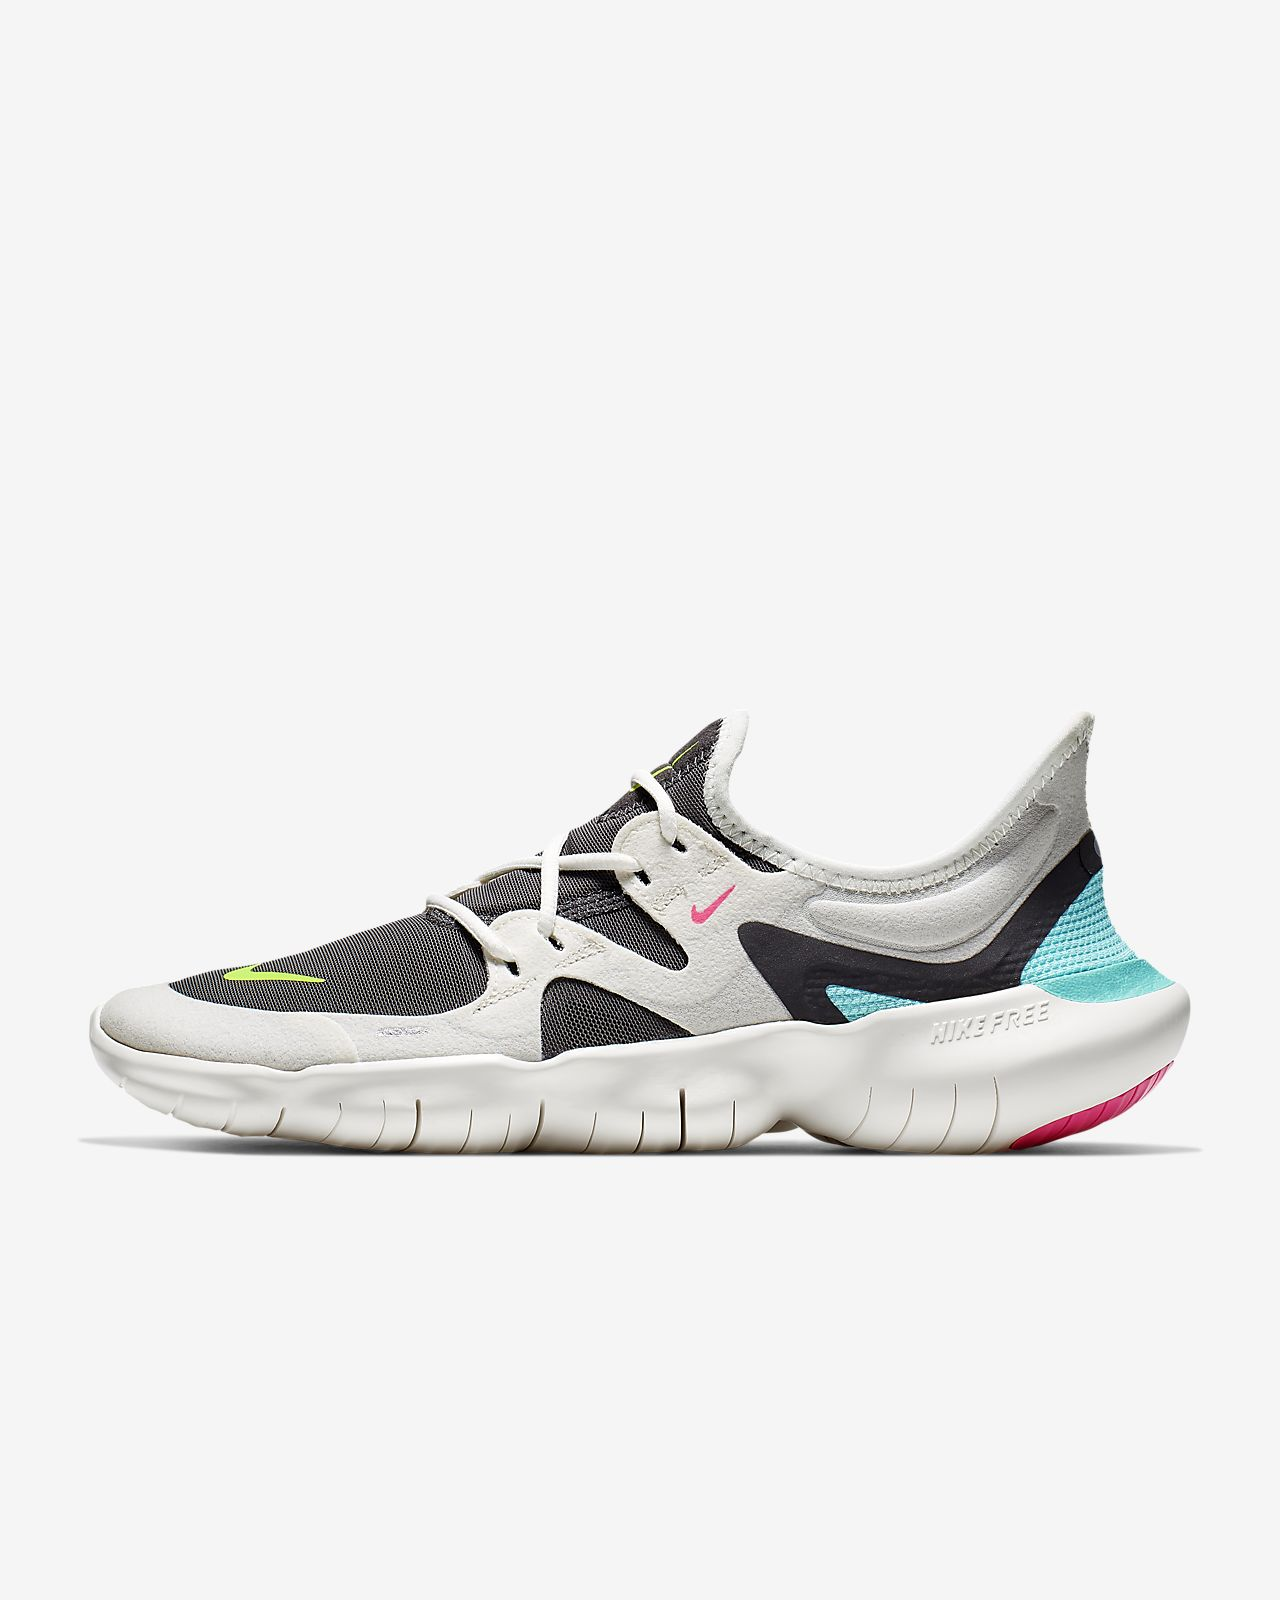 best service bd6dc cbe4b Nike Free RN 5.0 Zapatillas de running - Mujer